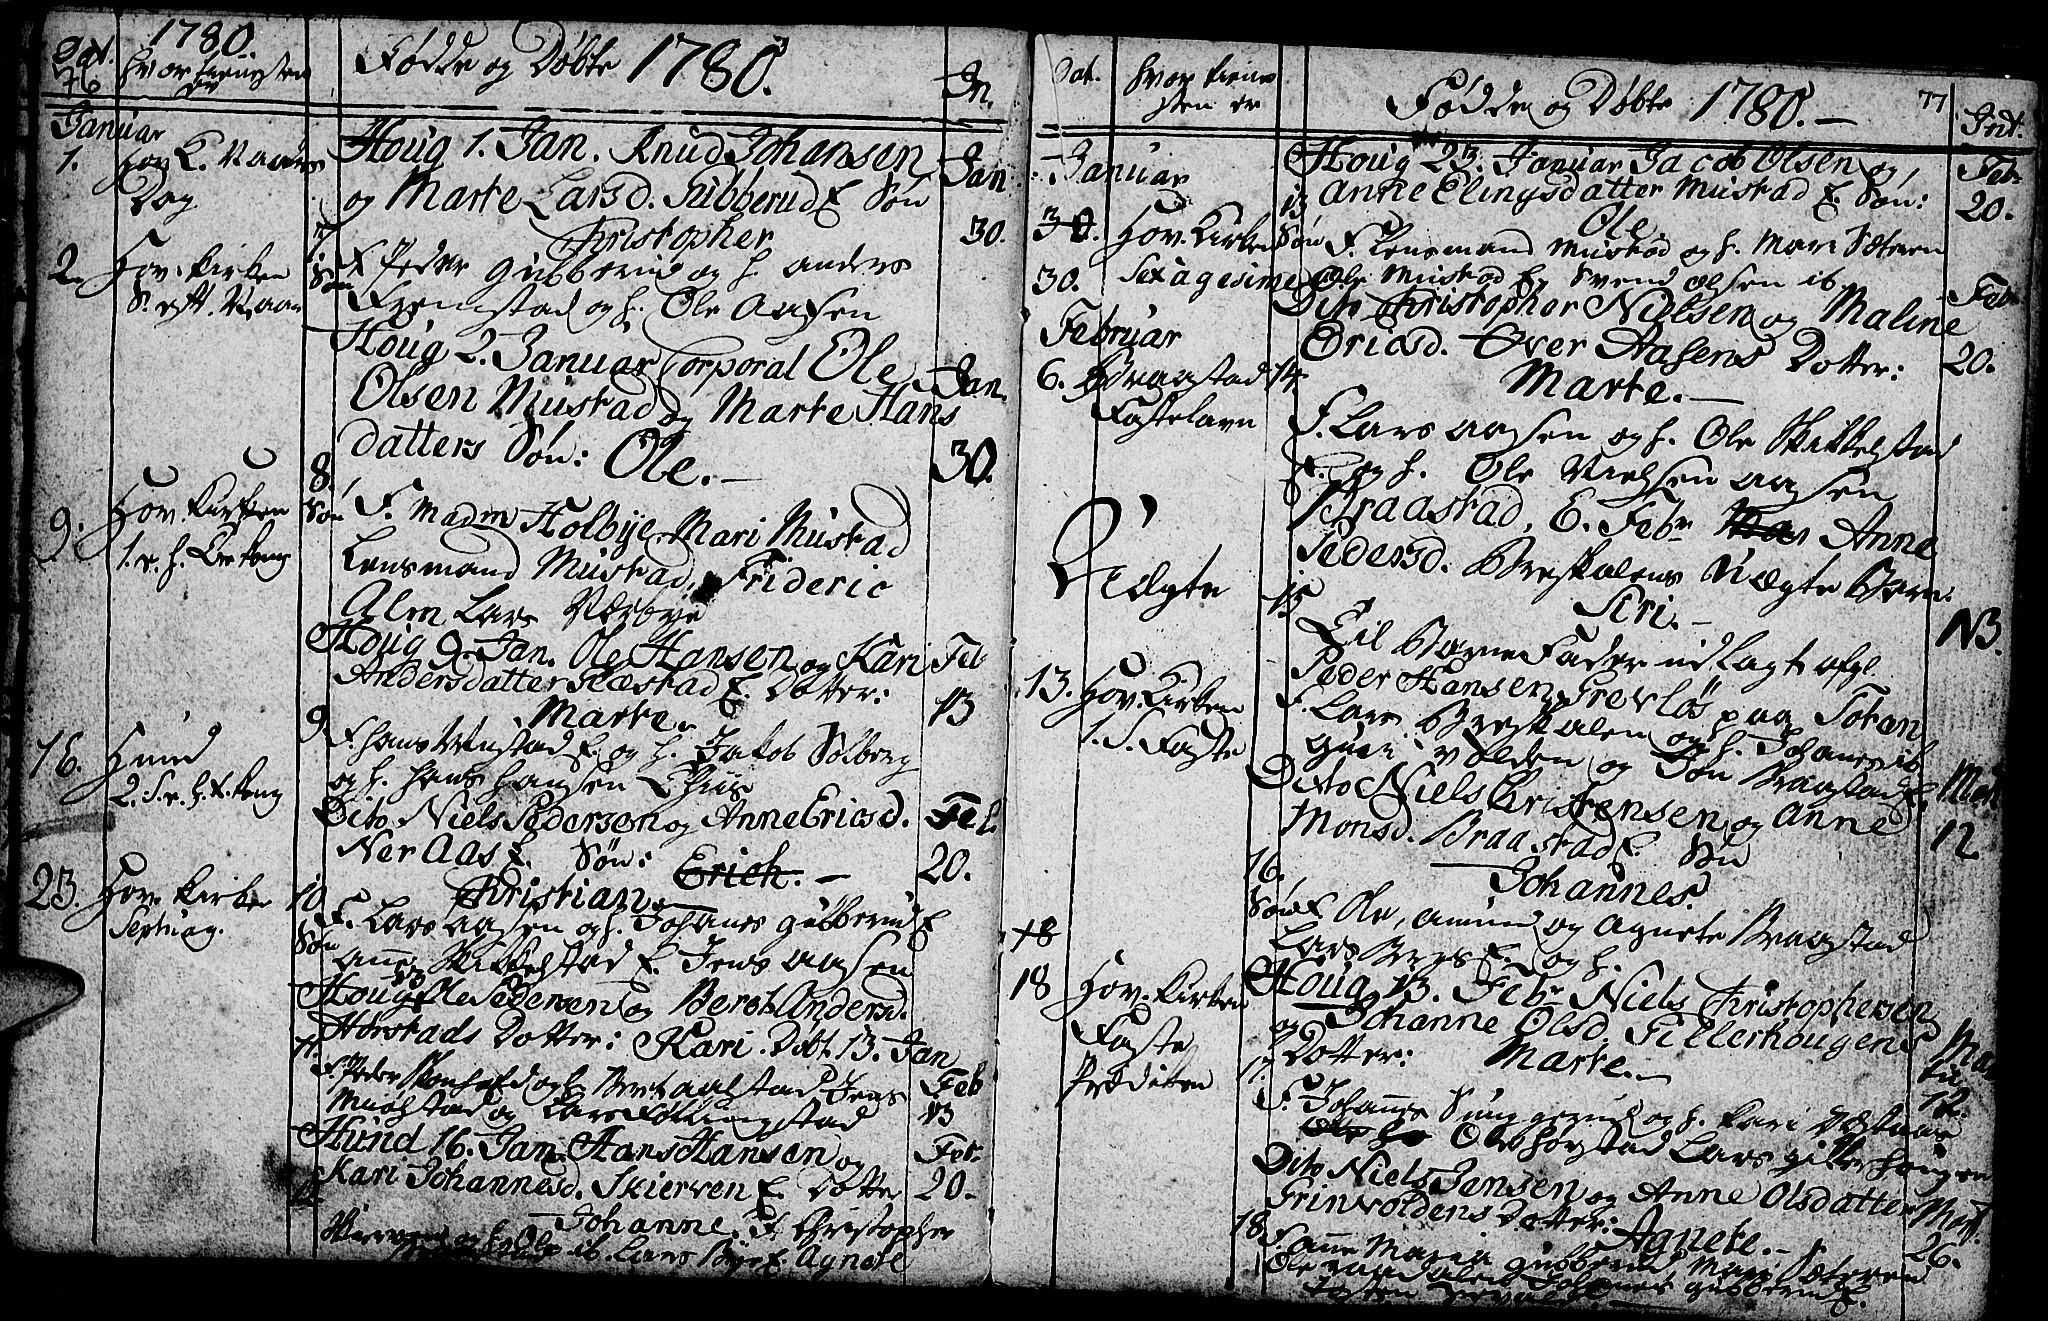 SAH, Vardal prestekontor, H/Ha/Hab/L0001: Klokkerbok nr. 1, 1771-1790, s. 76-77